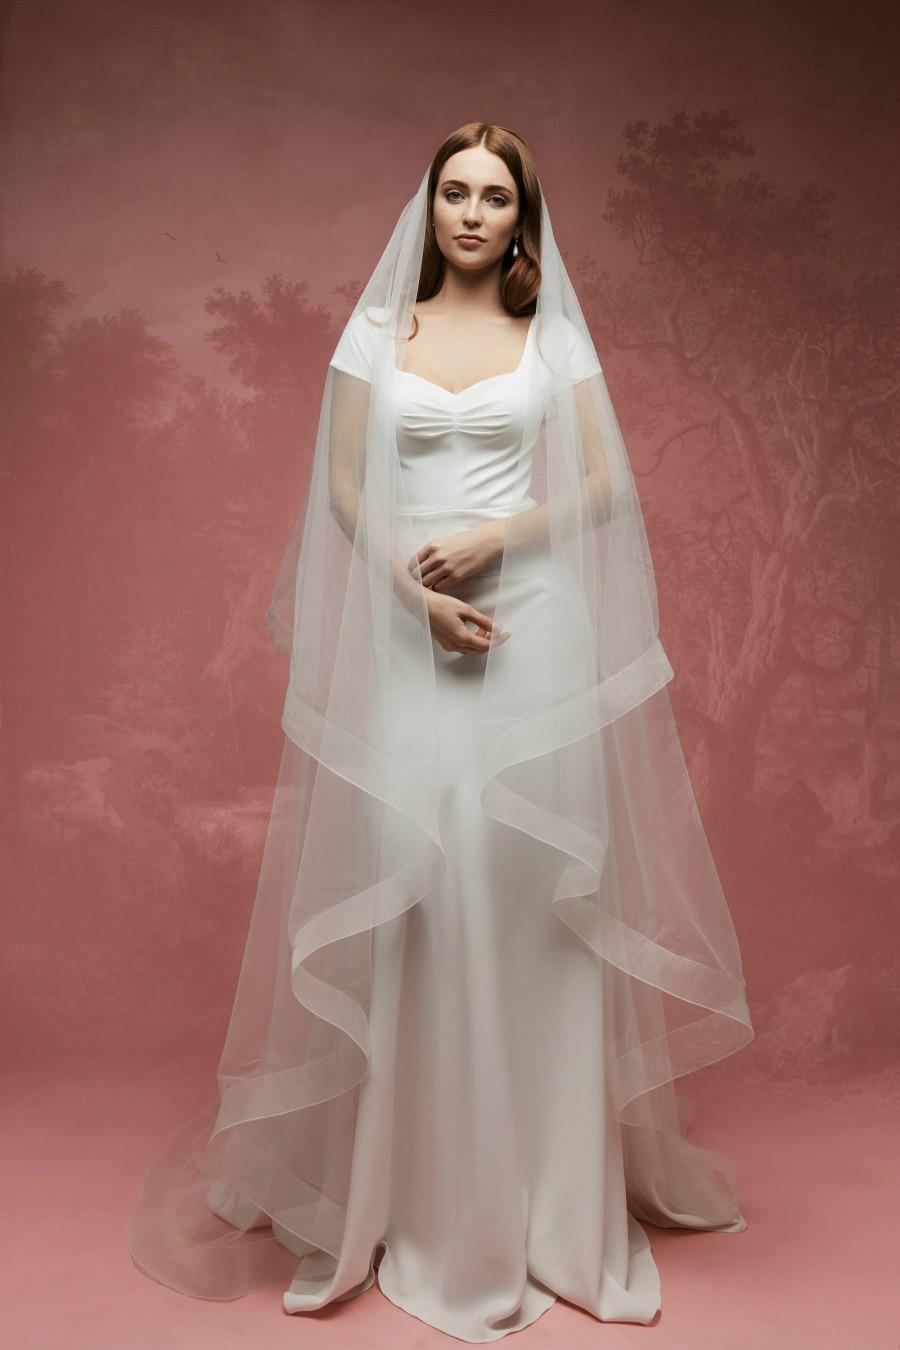 Mariage - Horsehair Veil A1(5), Bridal Veil, Horsehair Drop Veil, Wedding Veil, Horse Hair Wedding Veil, Ribbon Edge Wedding Veil, Cathedral Veil